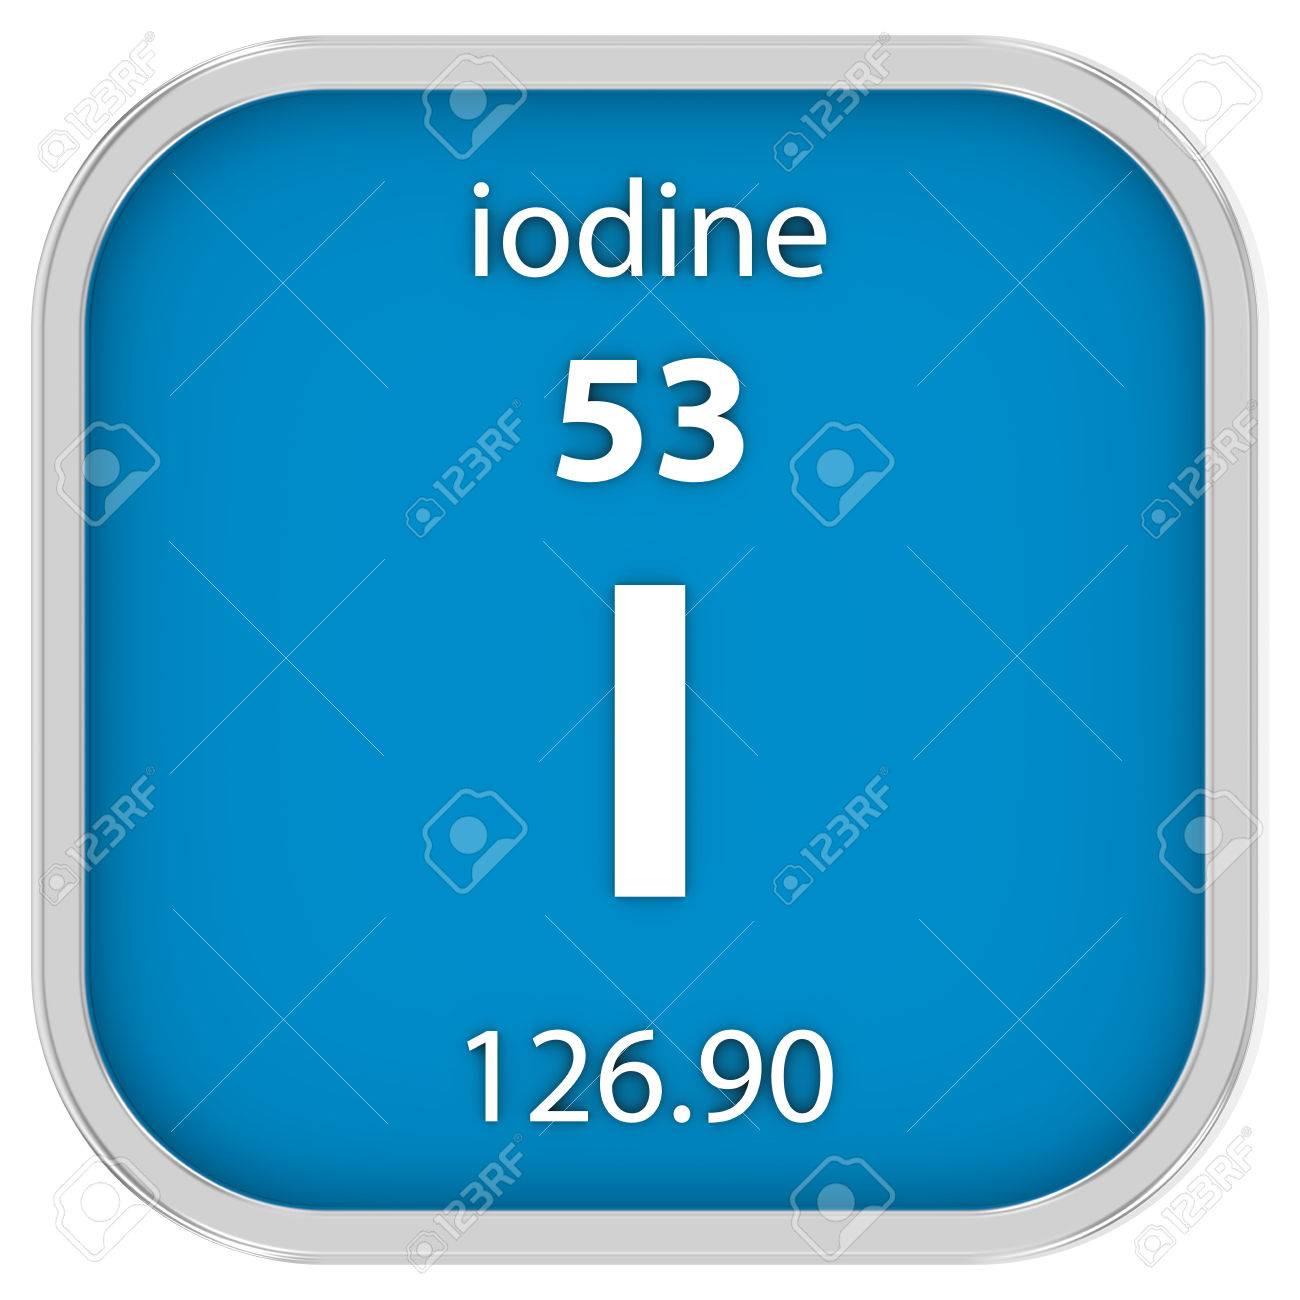 Iodine on periodic table images periodic table images iodine material on the periodic table part of a series stock iodine material on the periodic gamestrikefo Choice Image